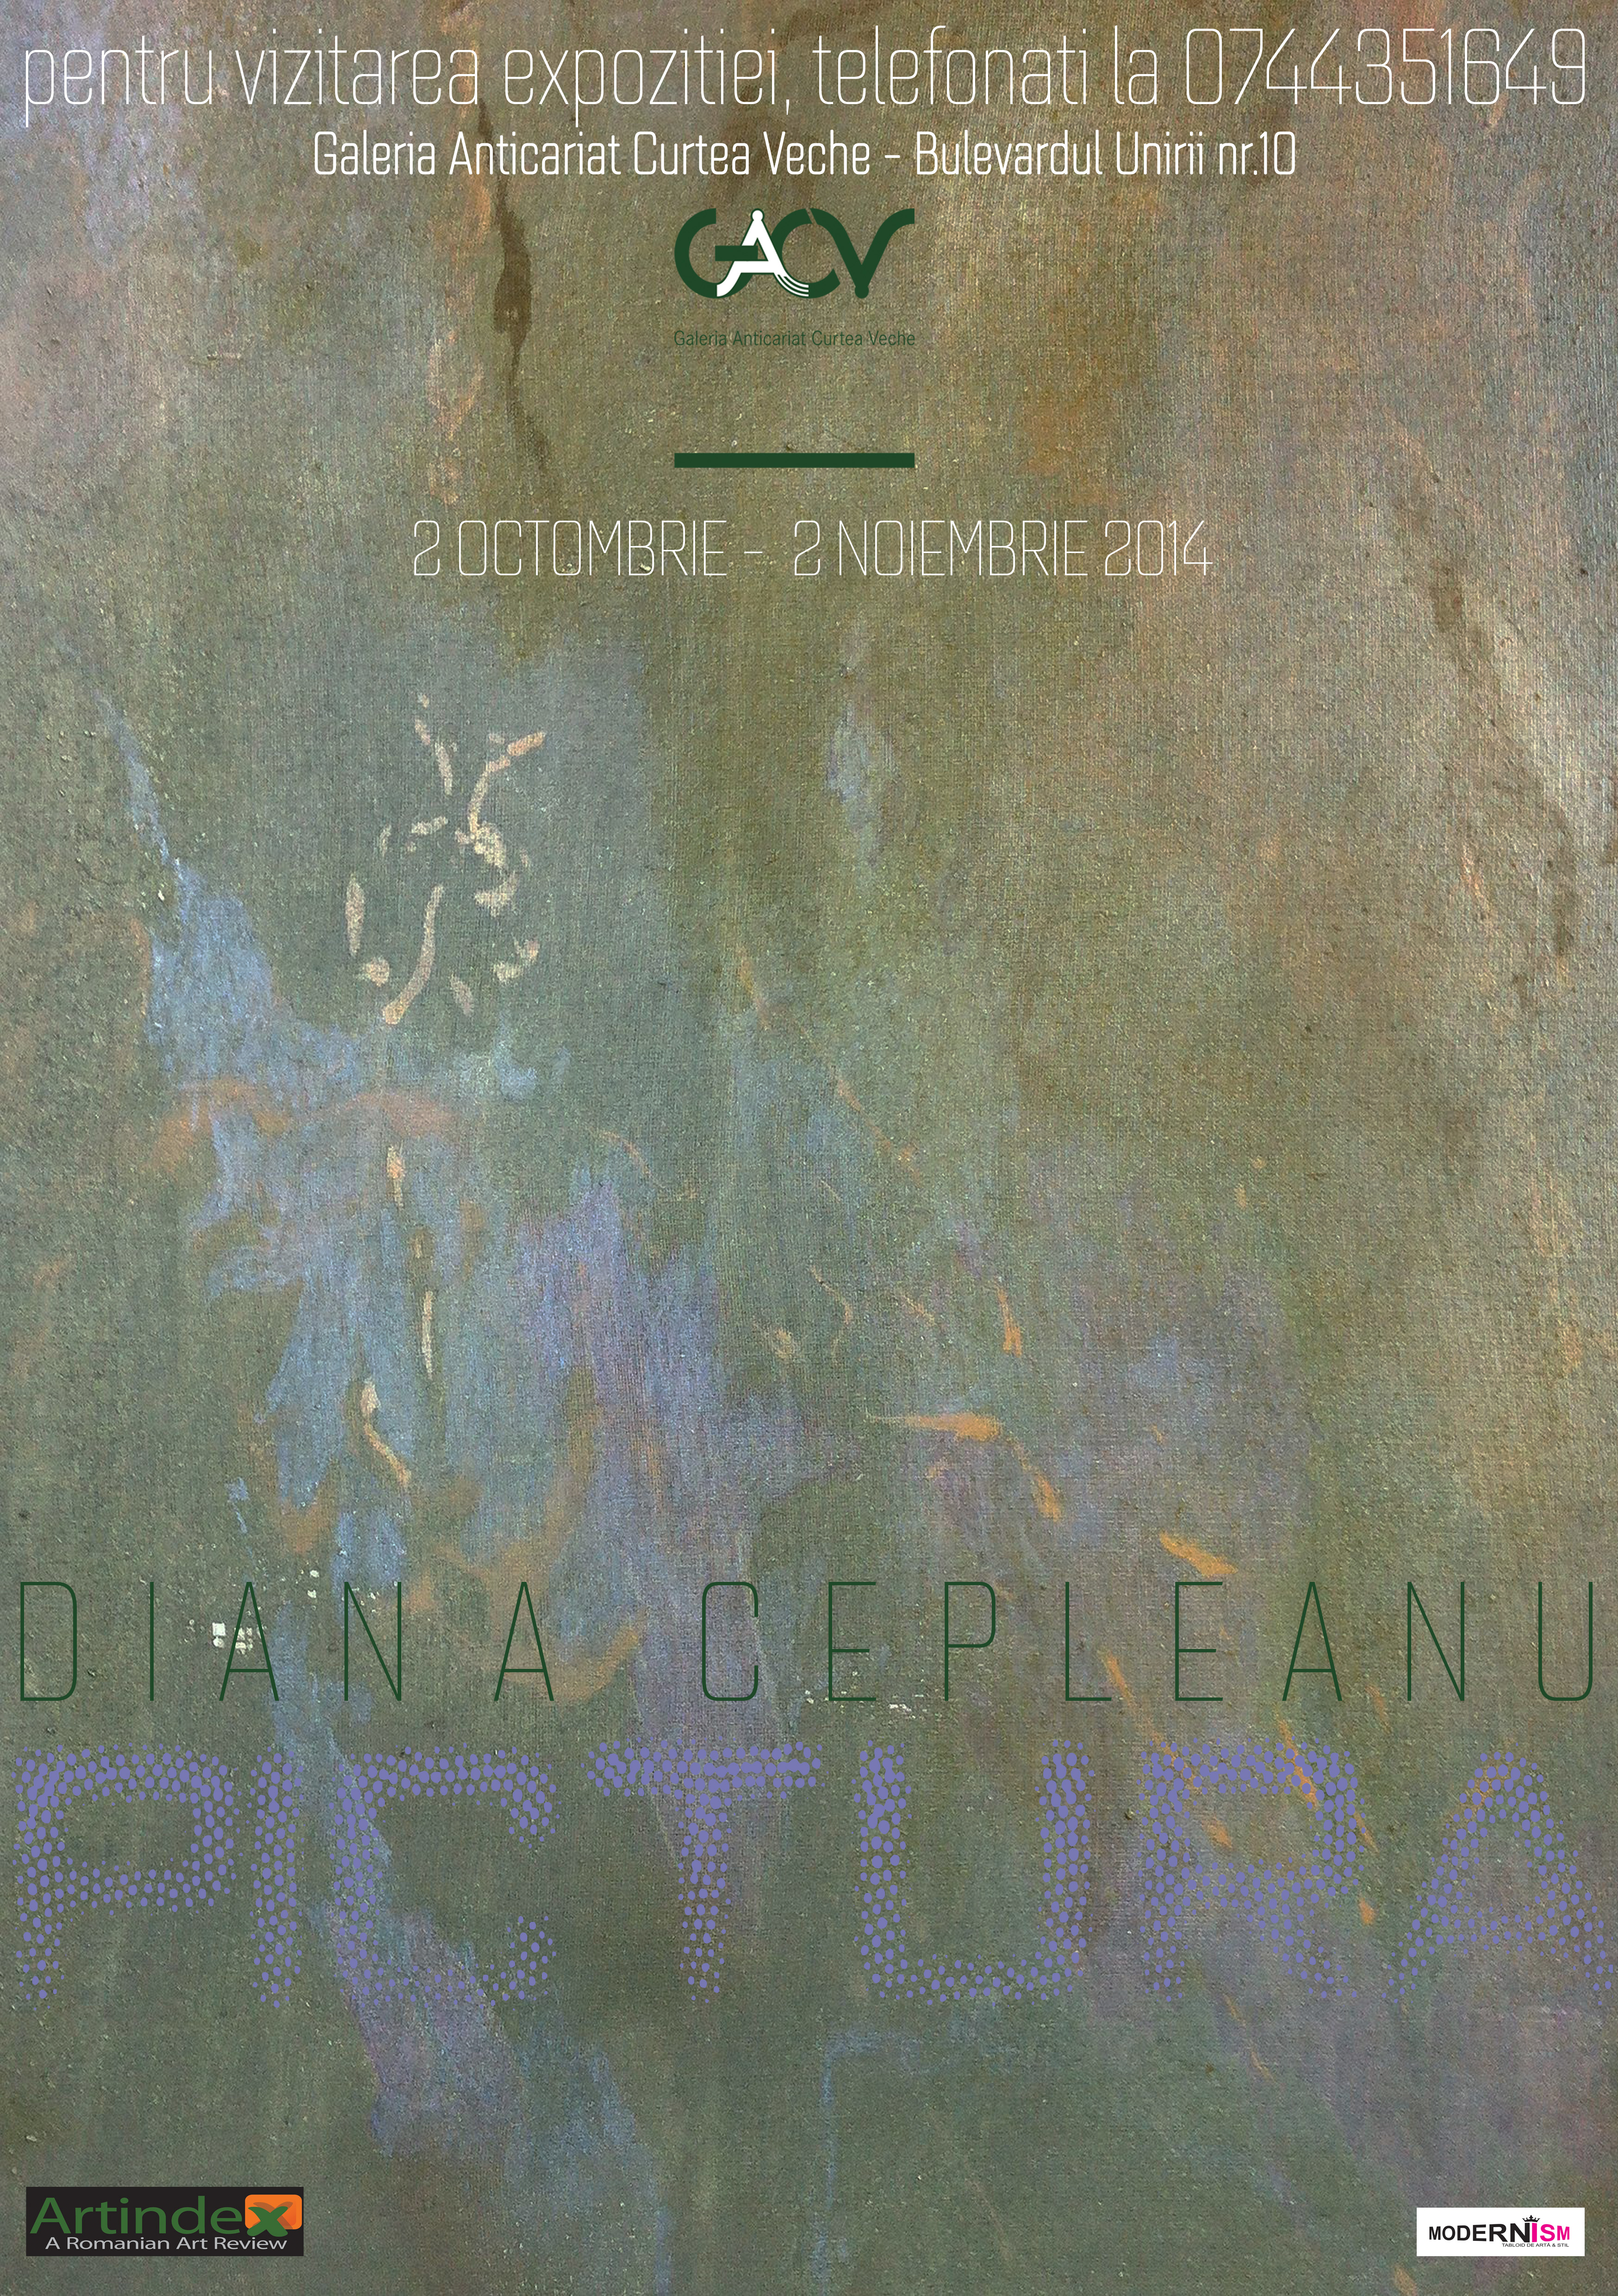 Diana Cepleanu @ Galeria Anticariat Curtea Veche, București